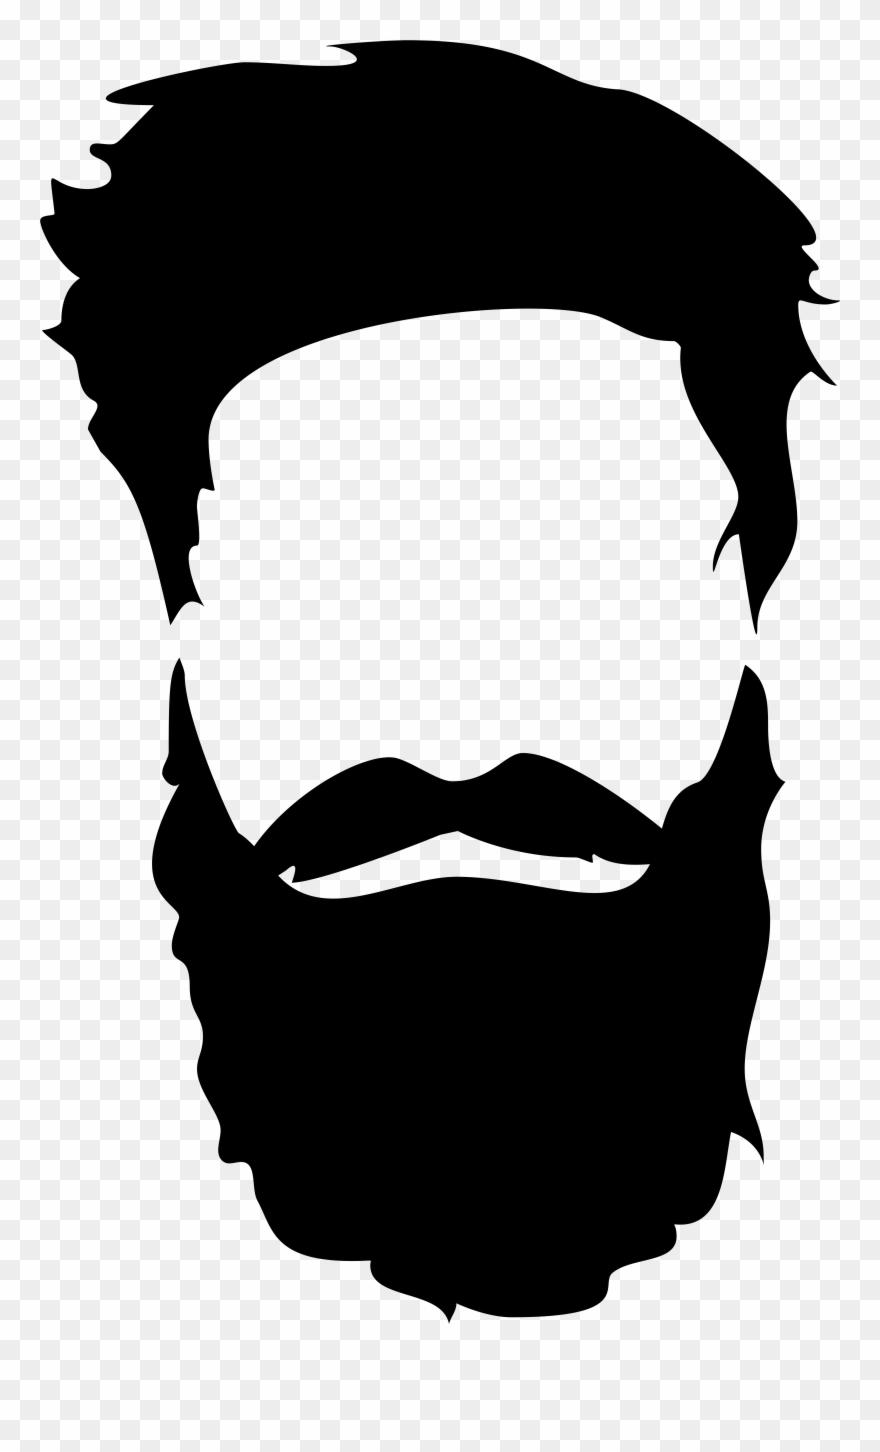 Hair Beard Png Clip Art Gallery Yopriceville.